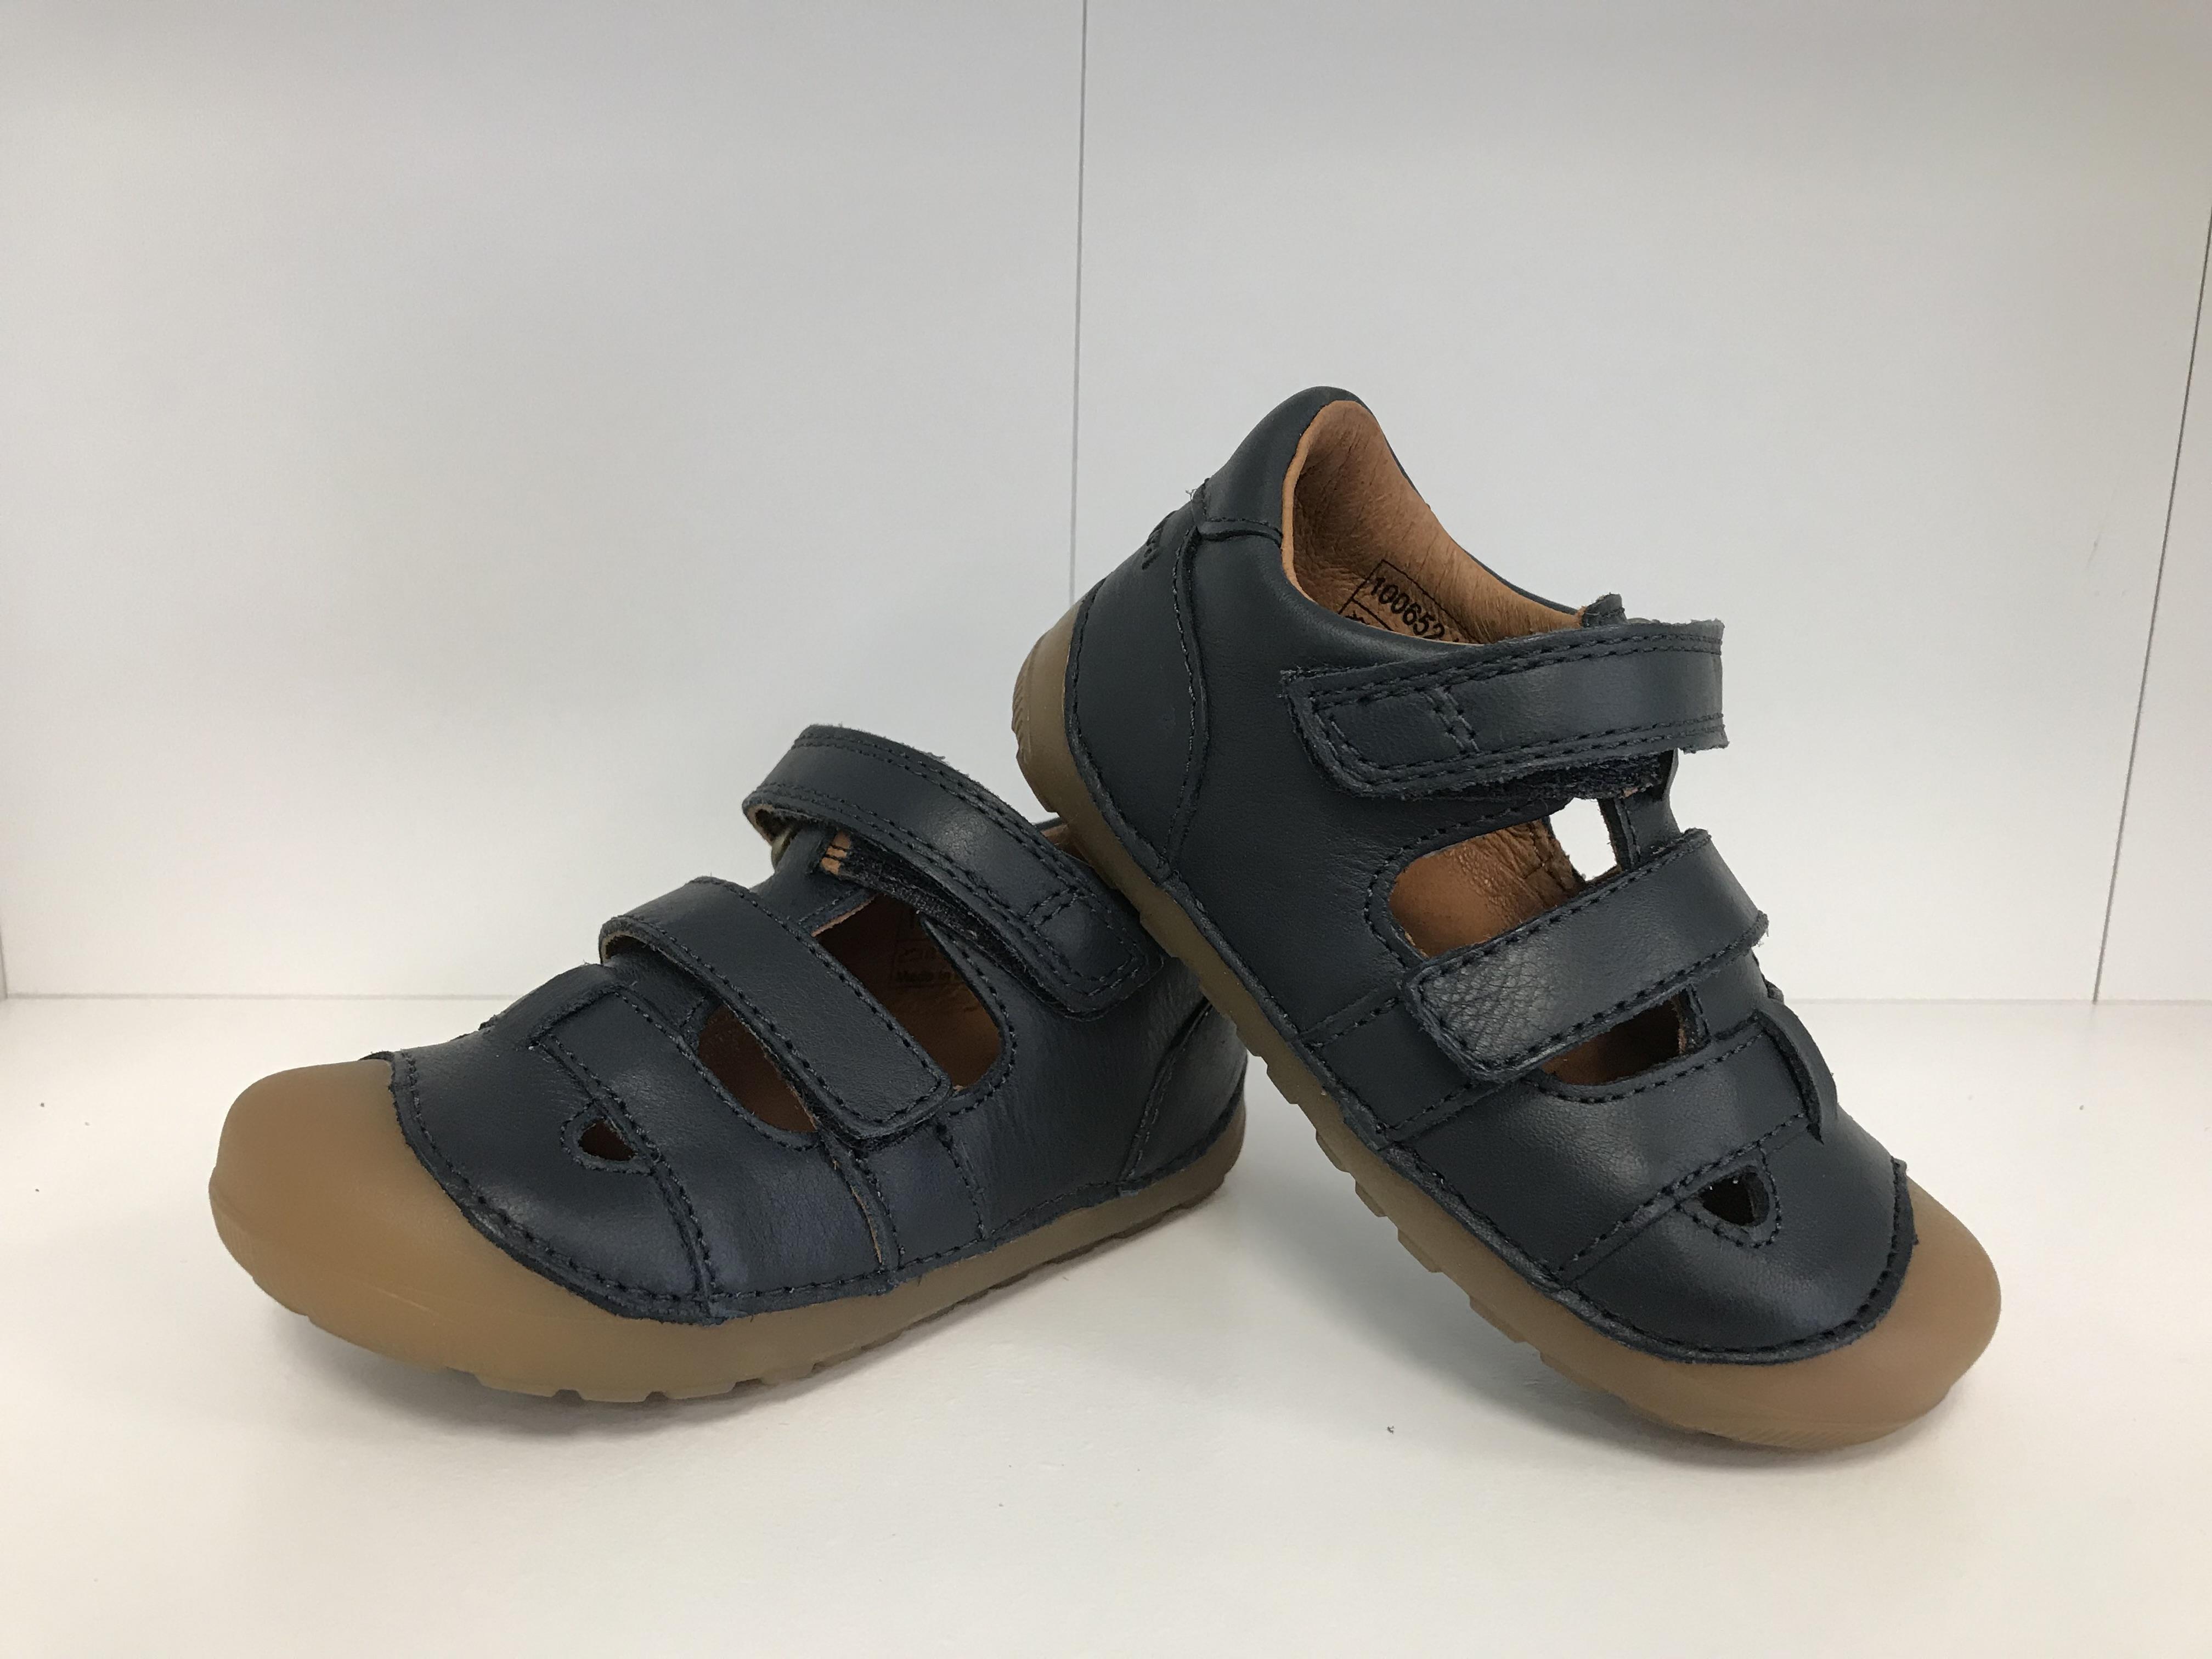 8a120135498 Bundgaard Petit Sandals Navy – Nožičkovo